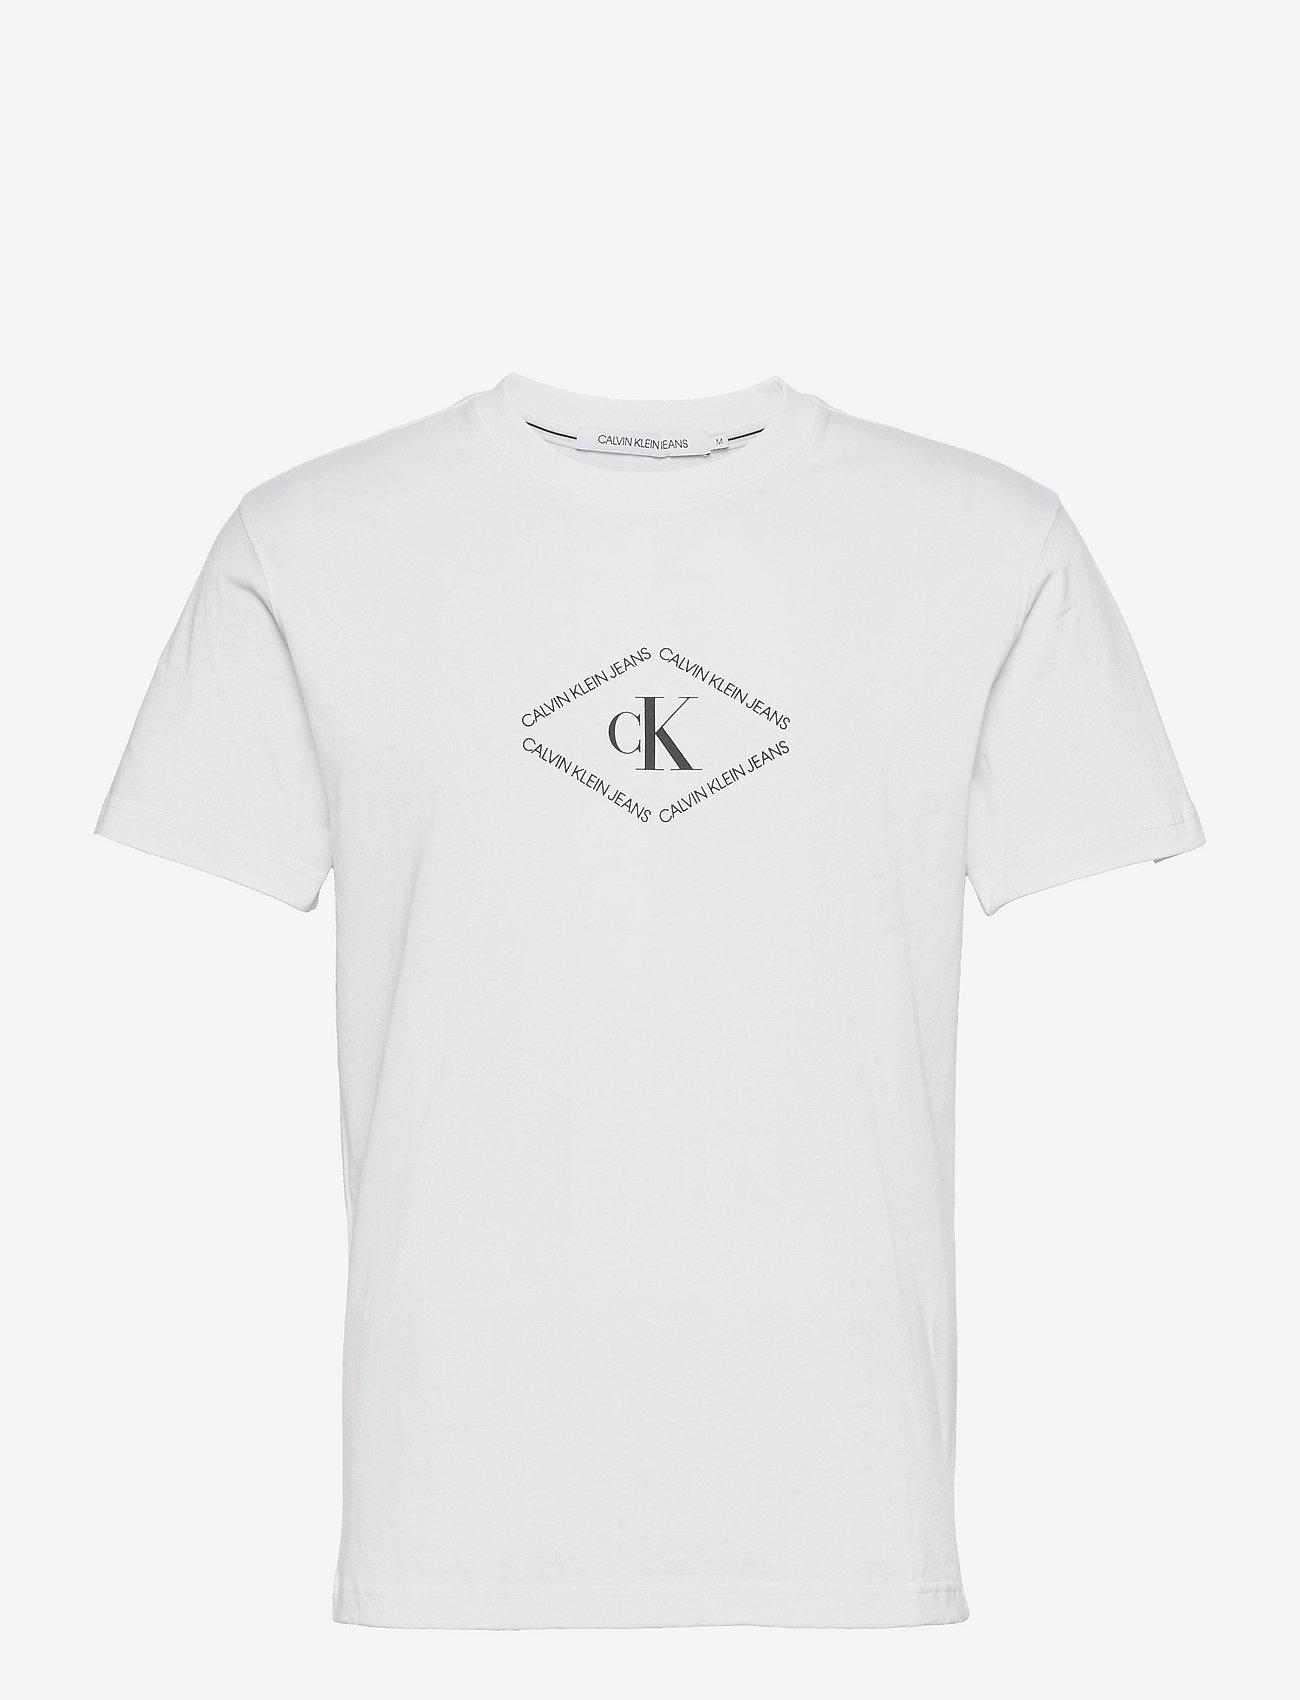 Calvin Klein Jeans - URBAN SKATE BACK GRAPHIC S/S TEE - t-shirts à manches courtes - bright white - 0